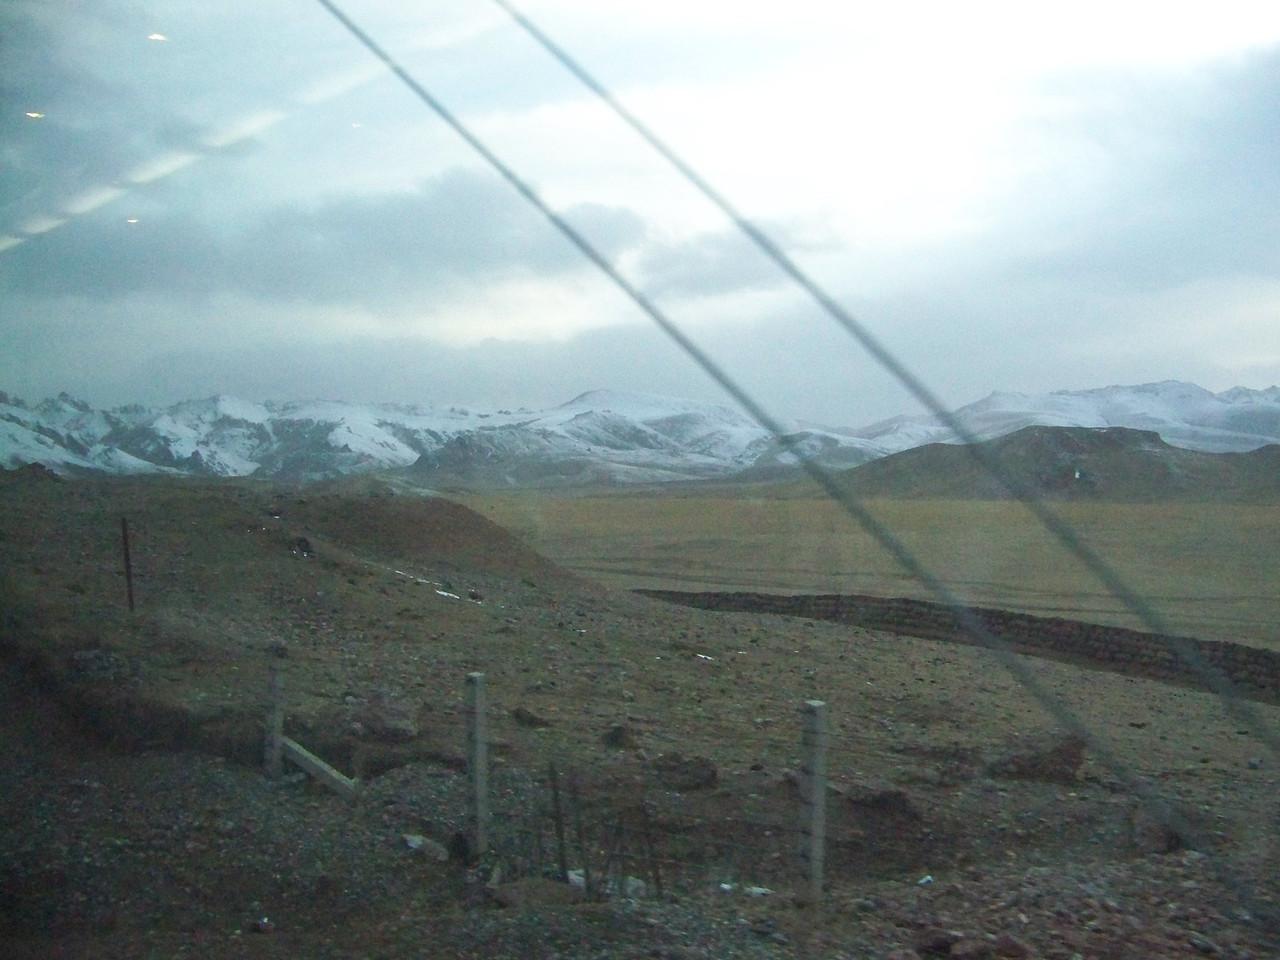 0093 - Scenery on Train Trip Between Beijing and Lhasa.JPG